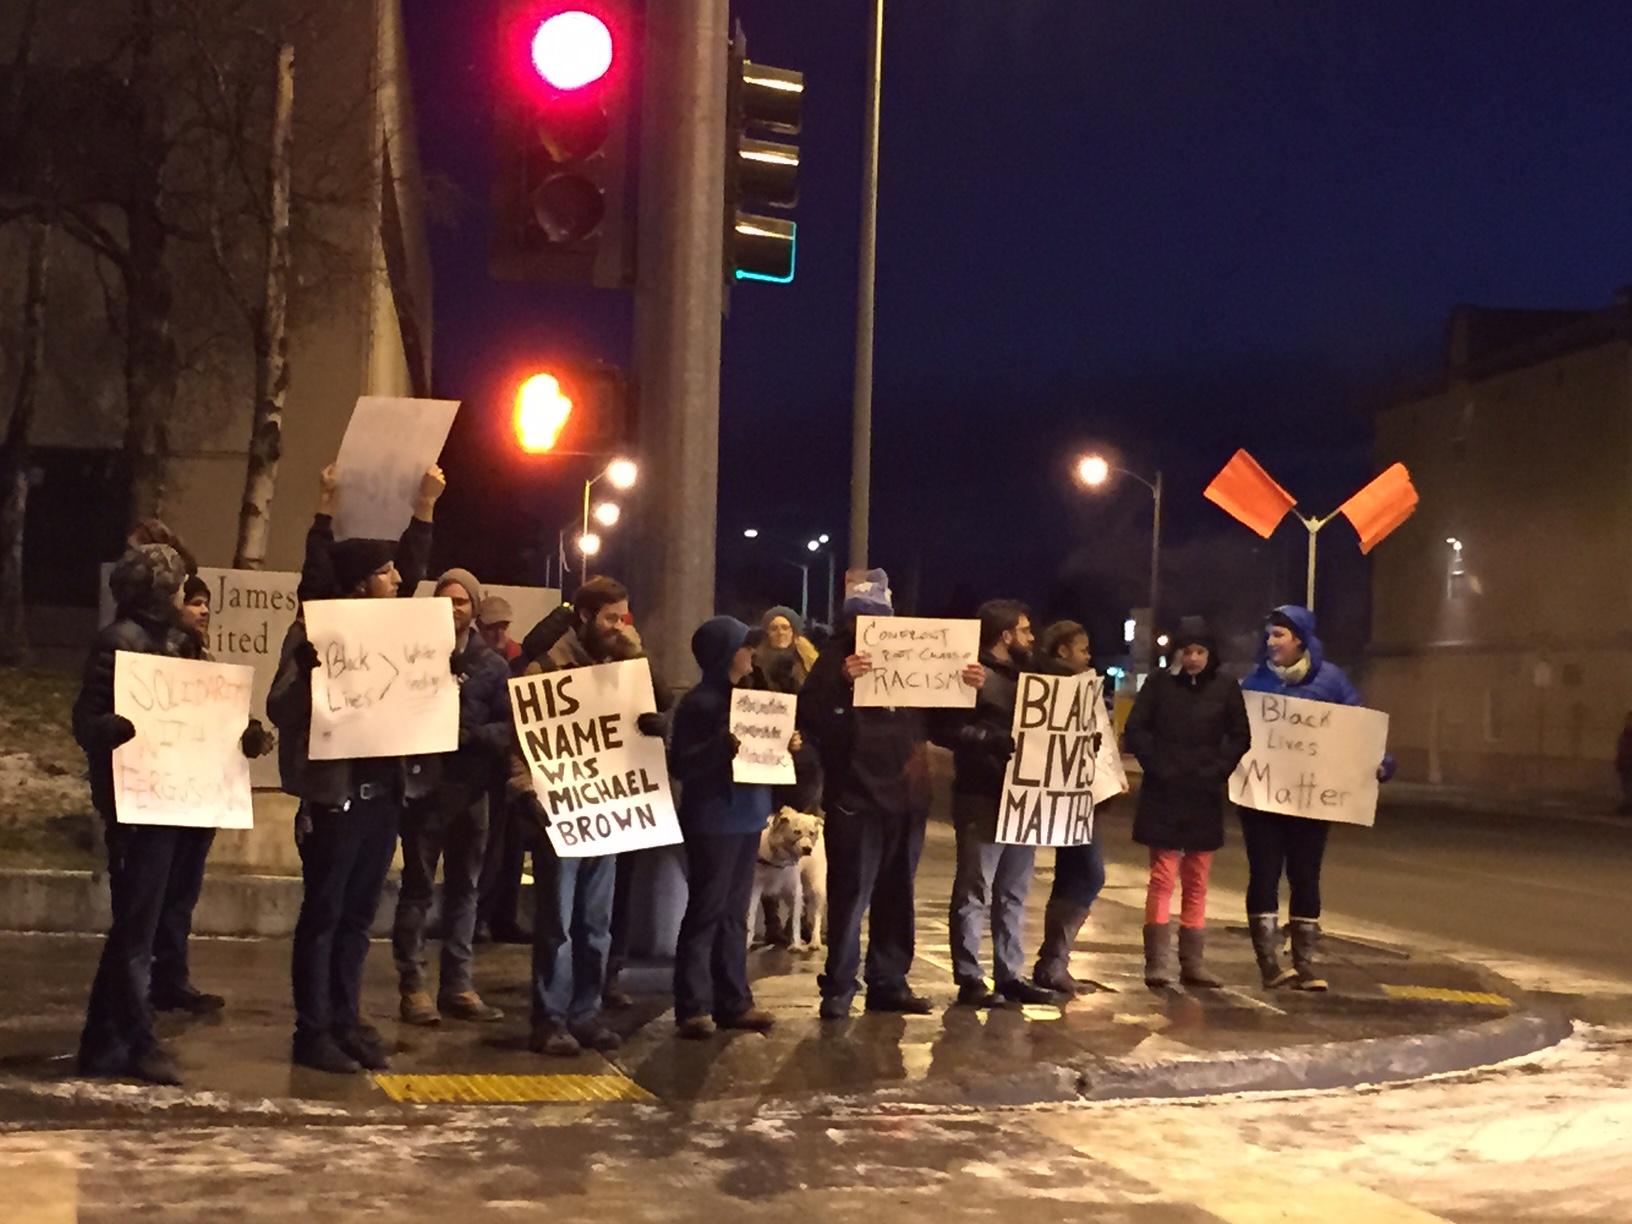 Anchorage Michael Brown solidarity demonstrators